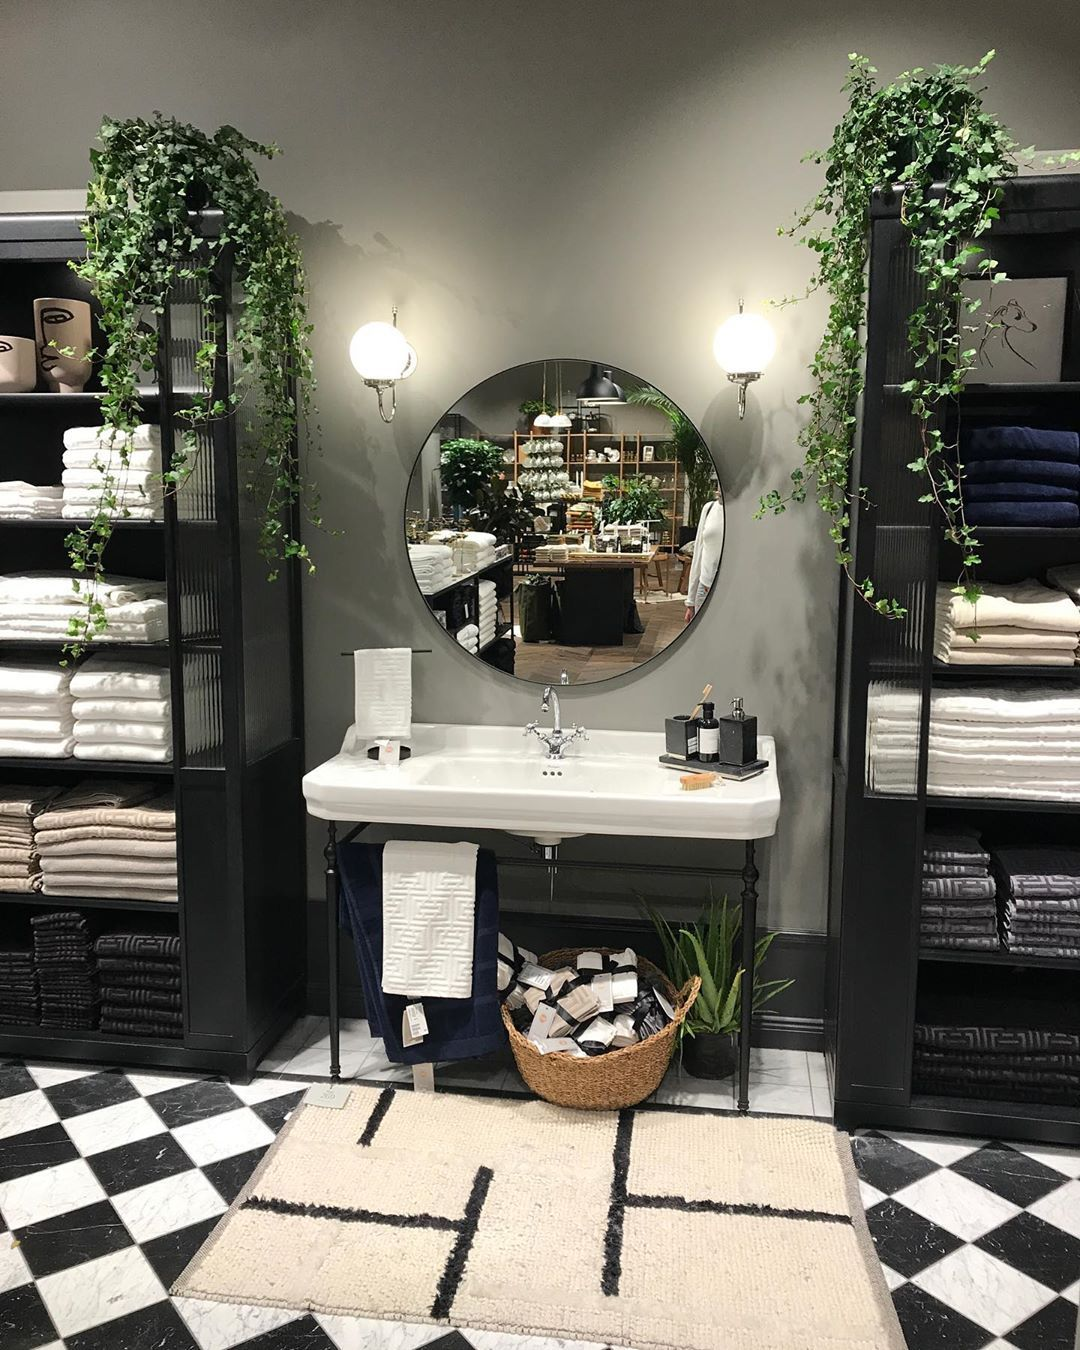 "🅒🅡🅔🅐🅣🅘🅥🅔 🅥🅜 on Instagram: ""H&M Home new concept store in Dubai Mall 👌🏻 @hmhome @dubaimall_ #hmhome #dubaimall #dubai #retail #retaildesign #retaildisplay #retailstore…"""